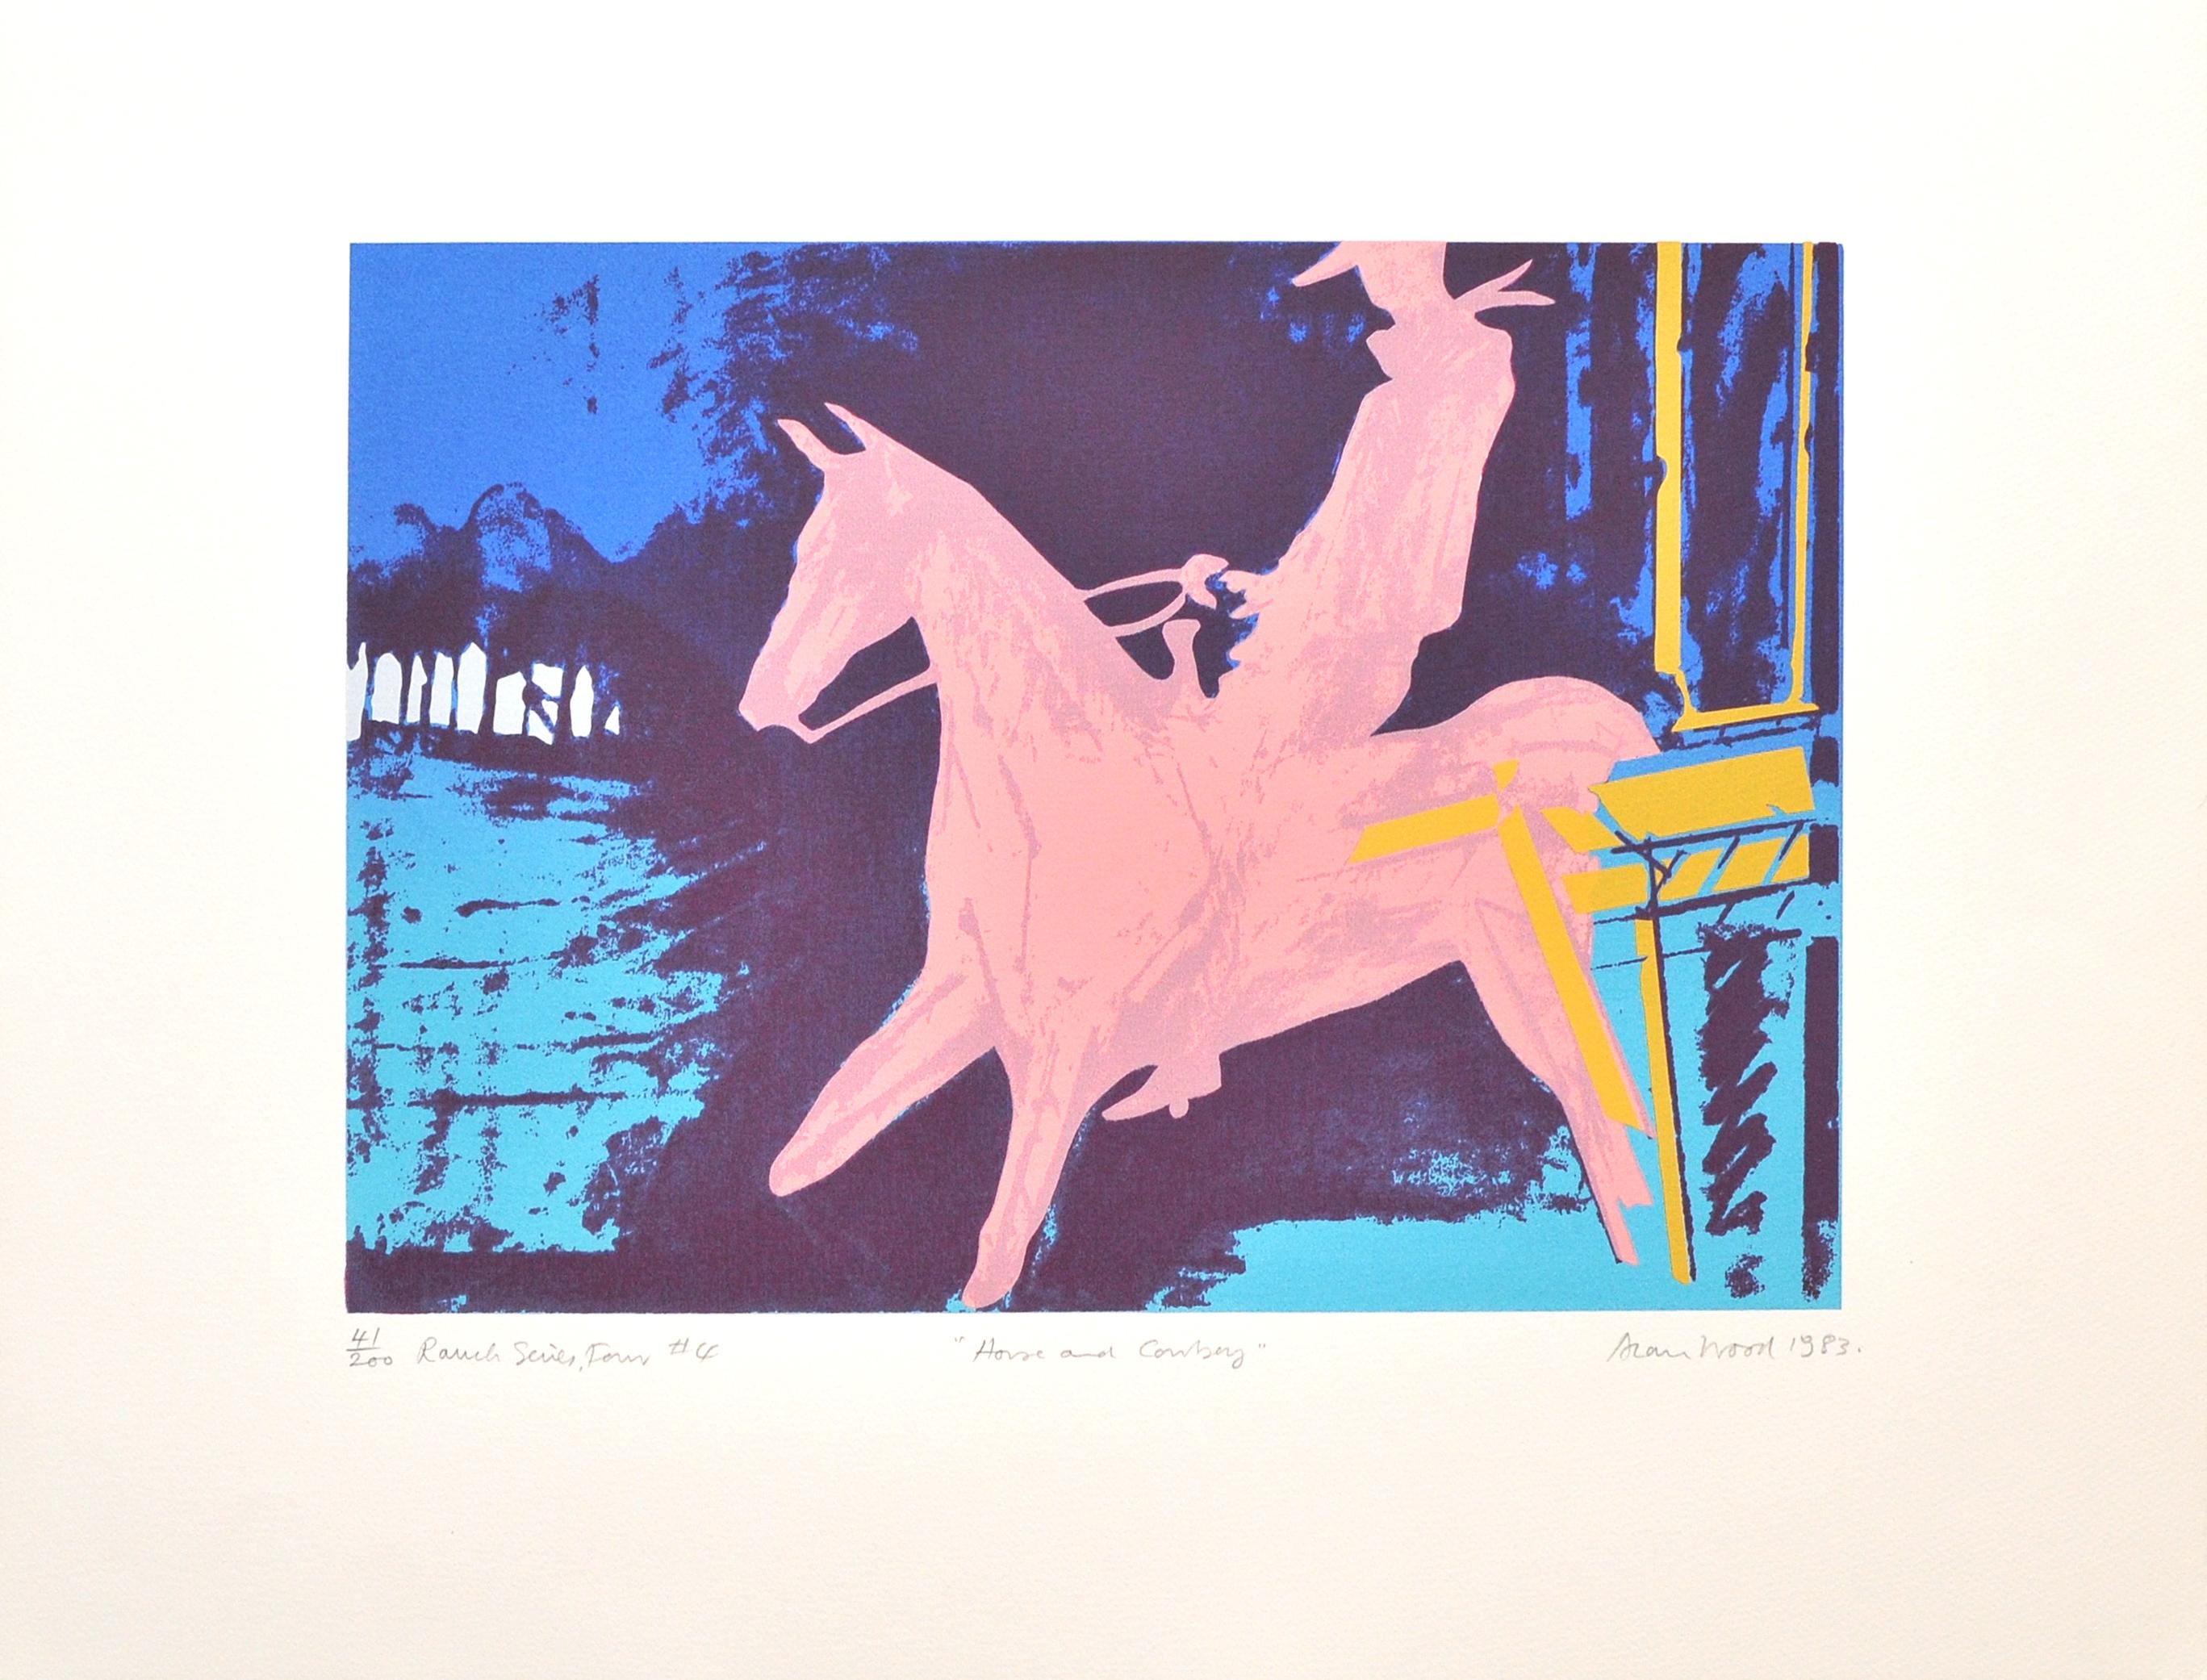 Alan_Woods_1983_Prints_#41_RanchSeriesFour#4_HorseandCowboy